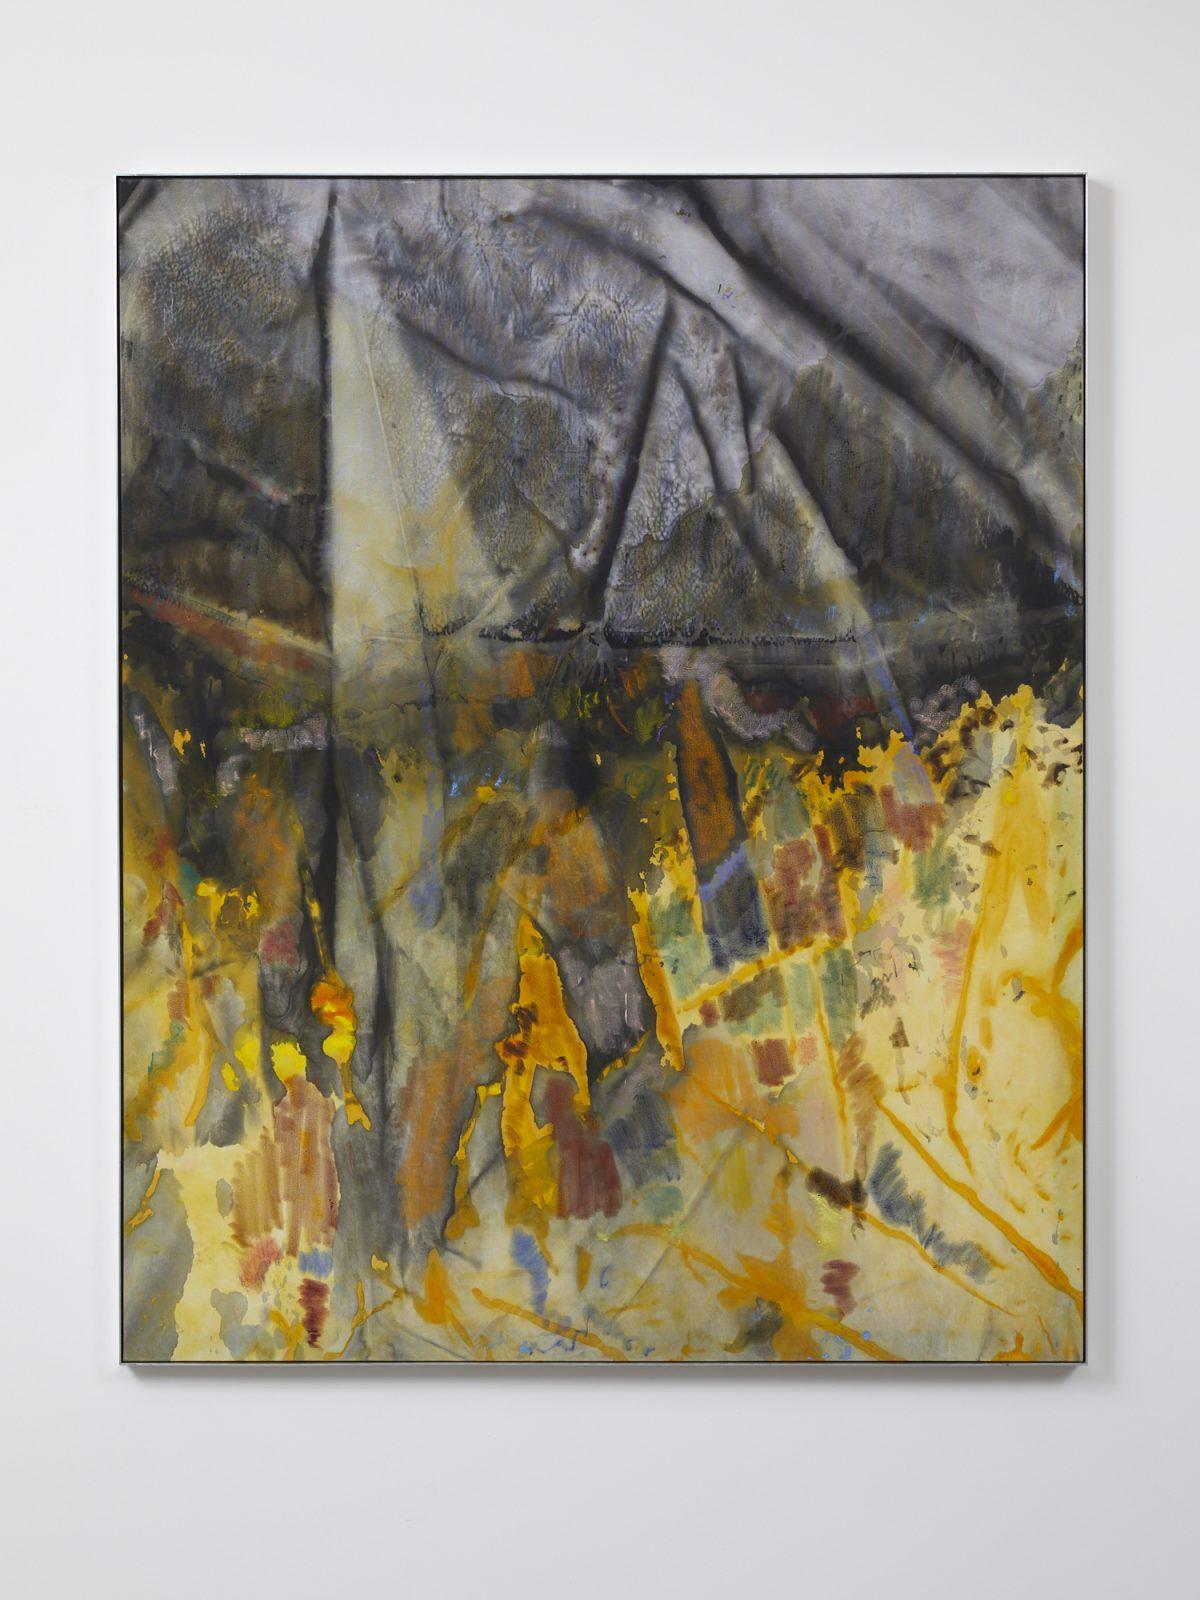 Matt Arbuckle featured artwork